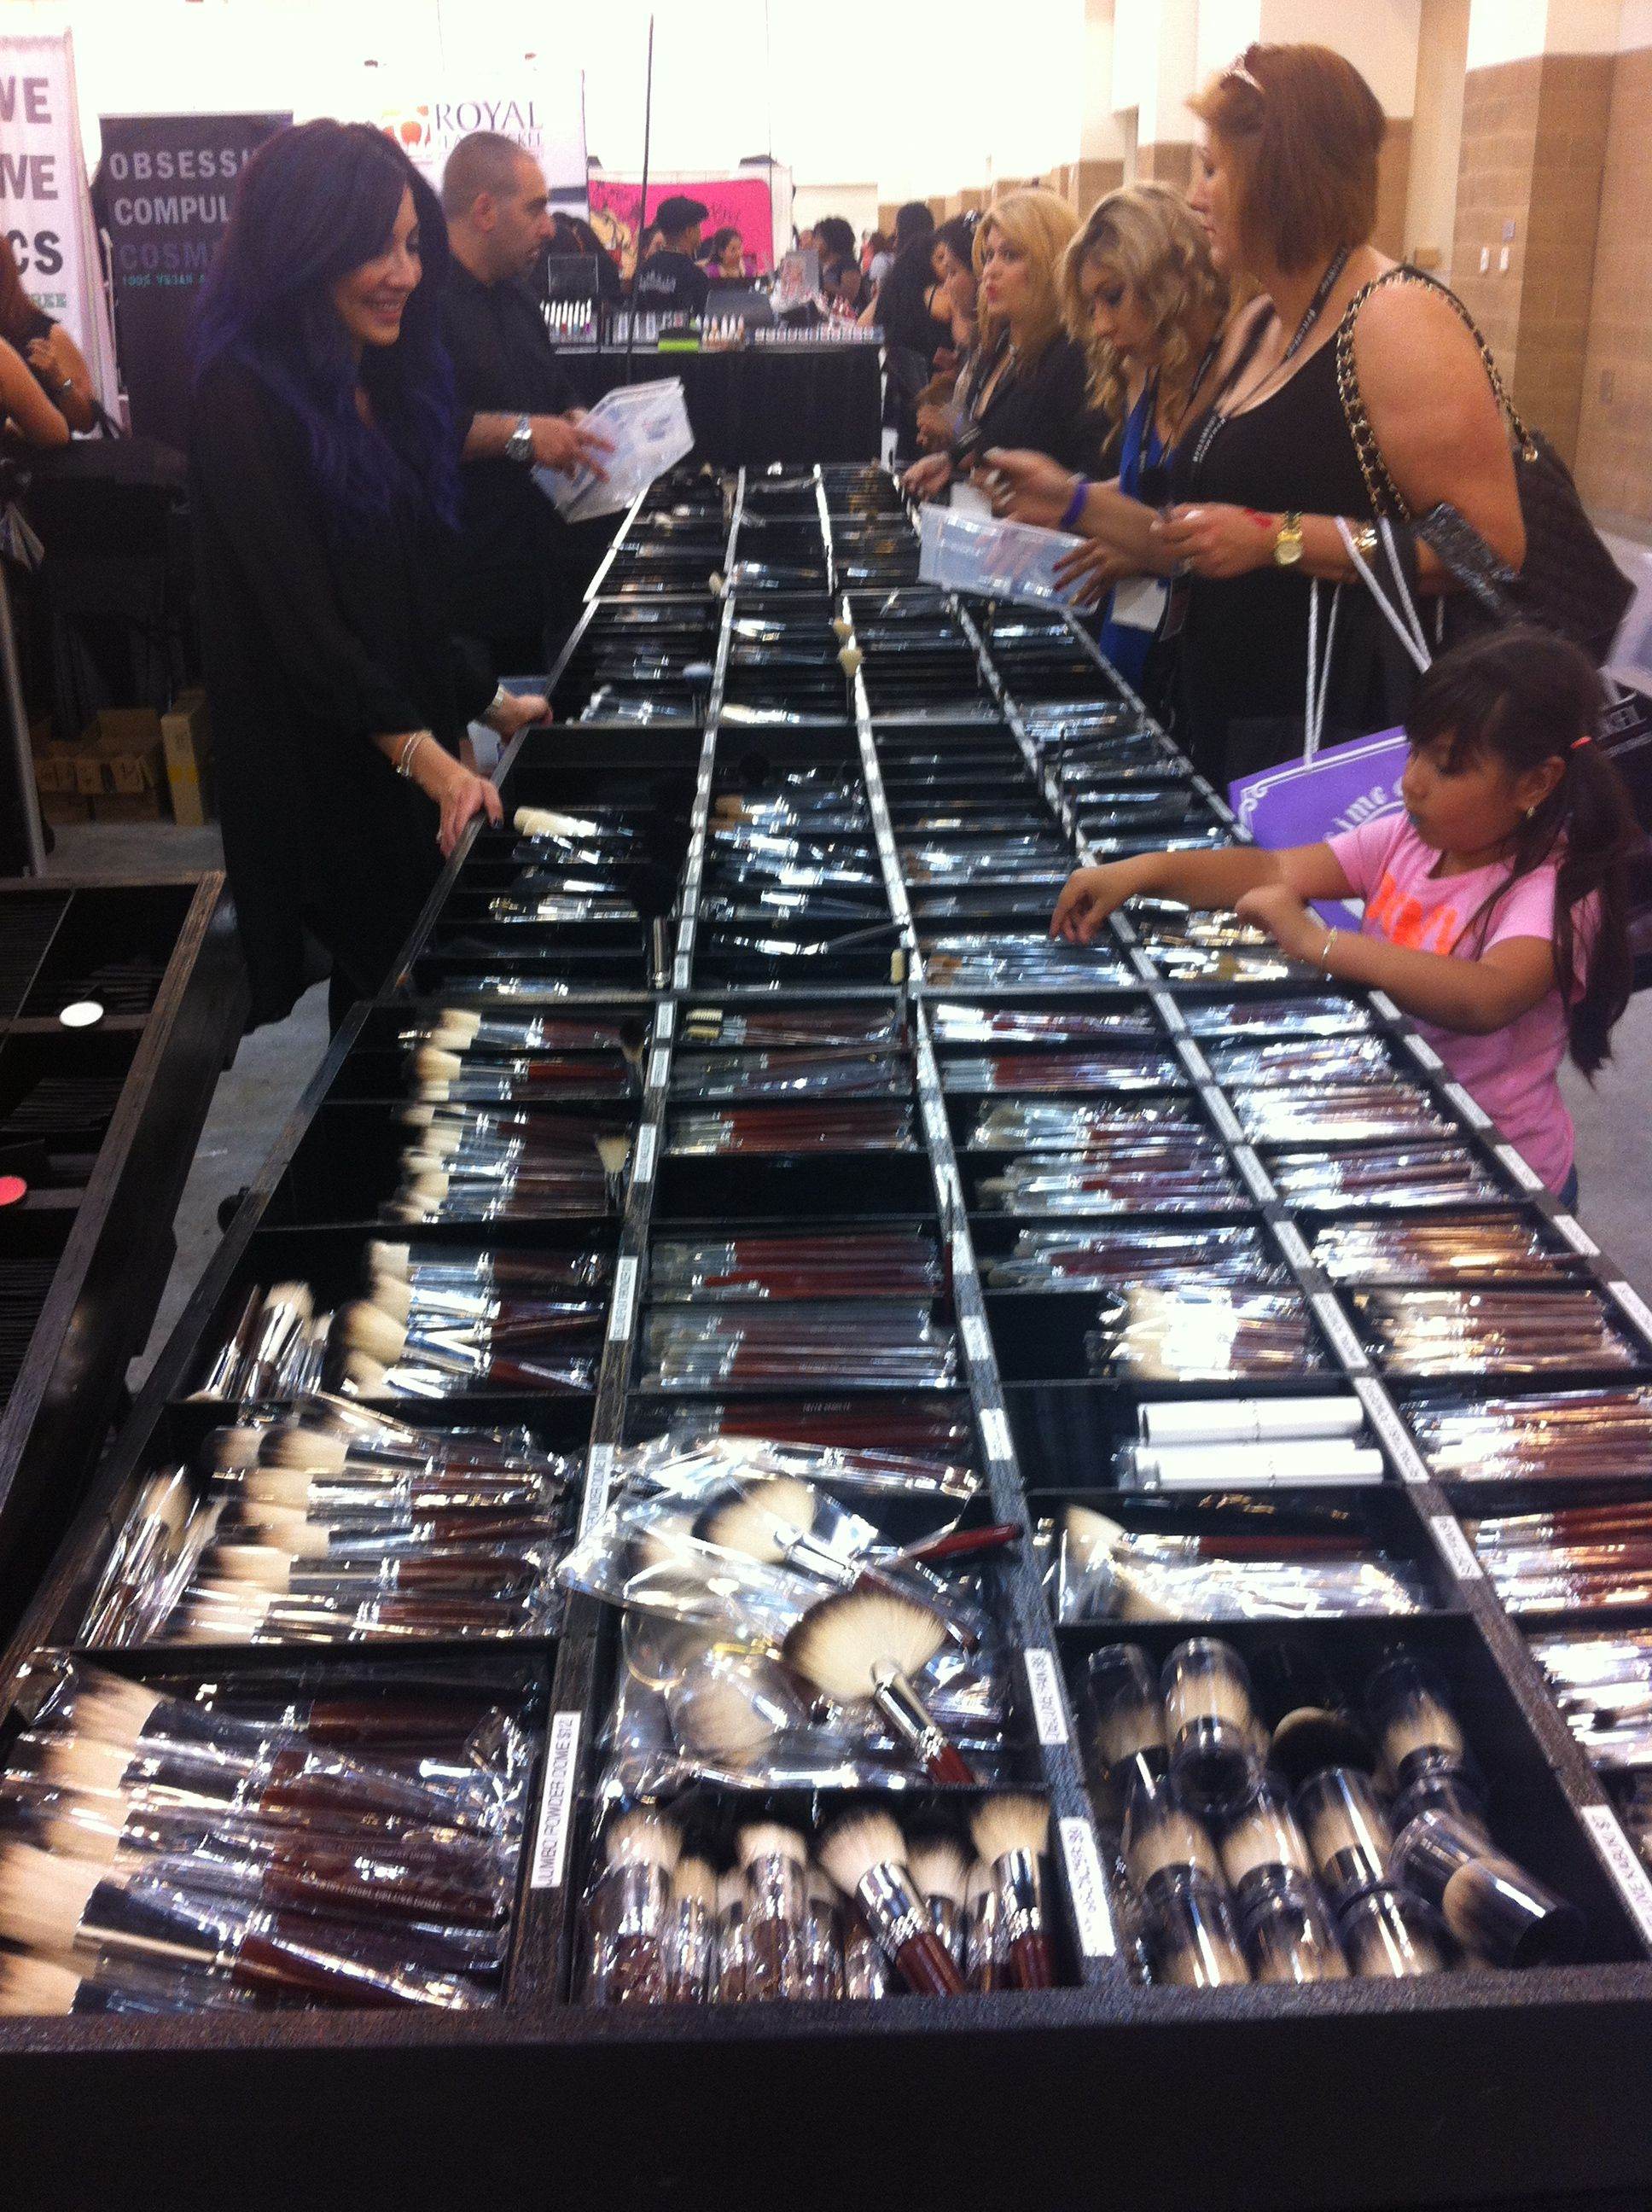 At Morphe Brushes at PHAMExpo Loja de cosméticos, Maquiagem